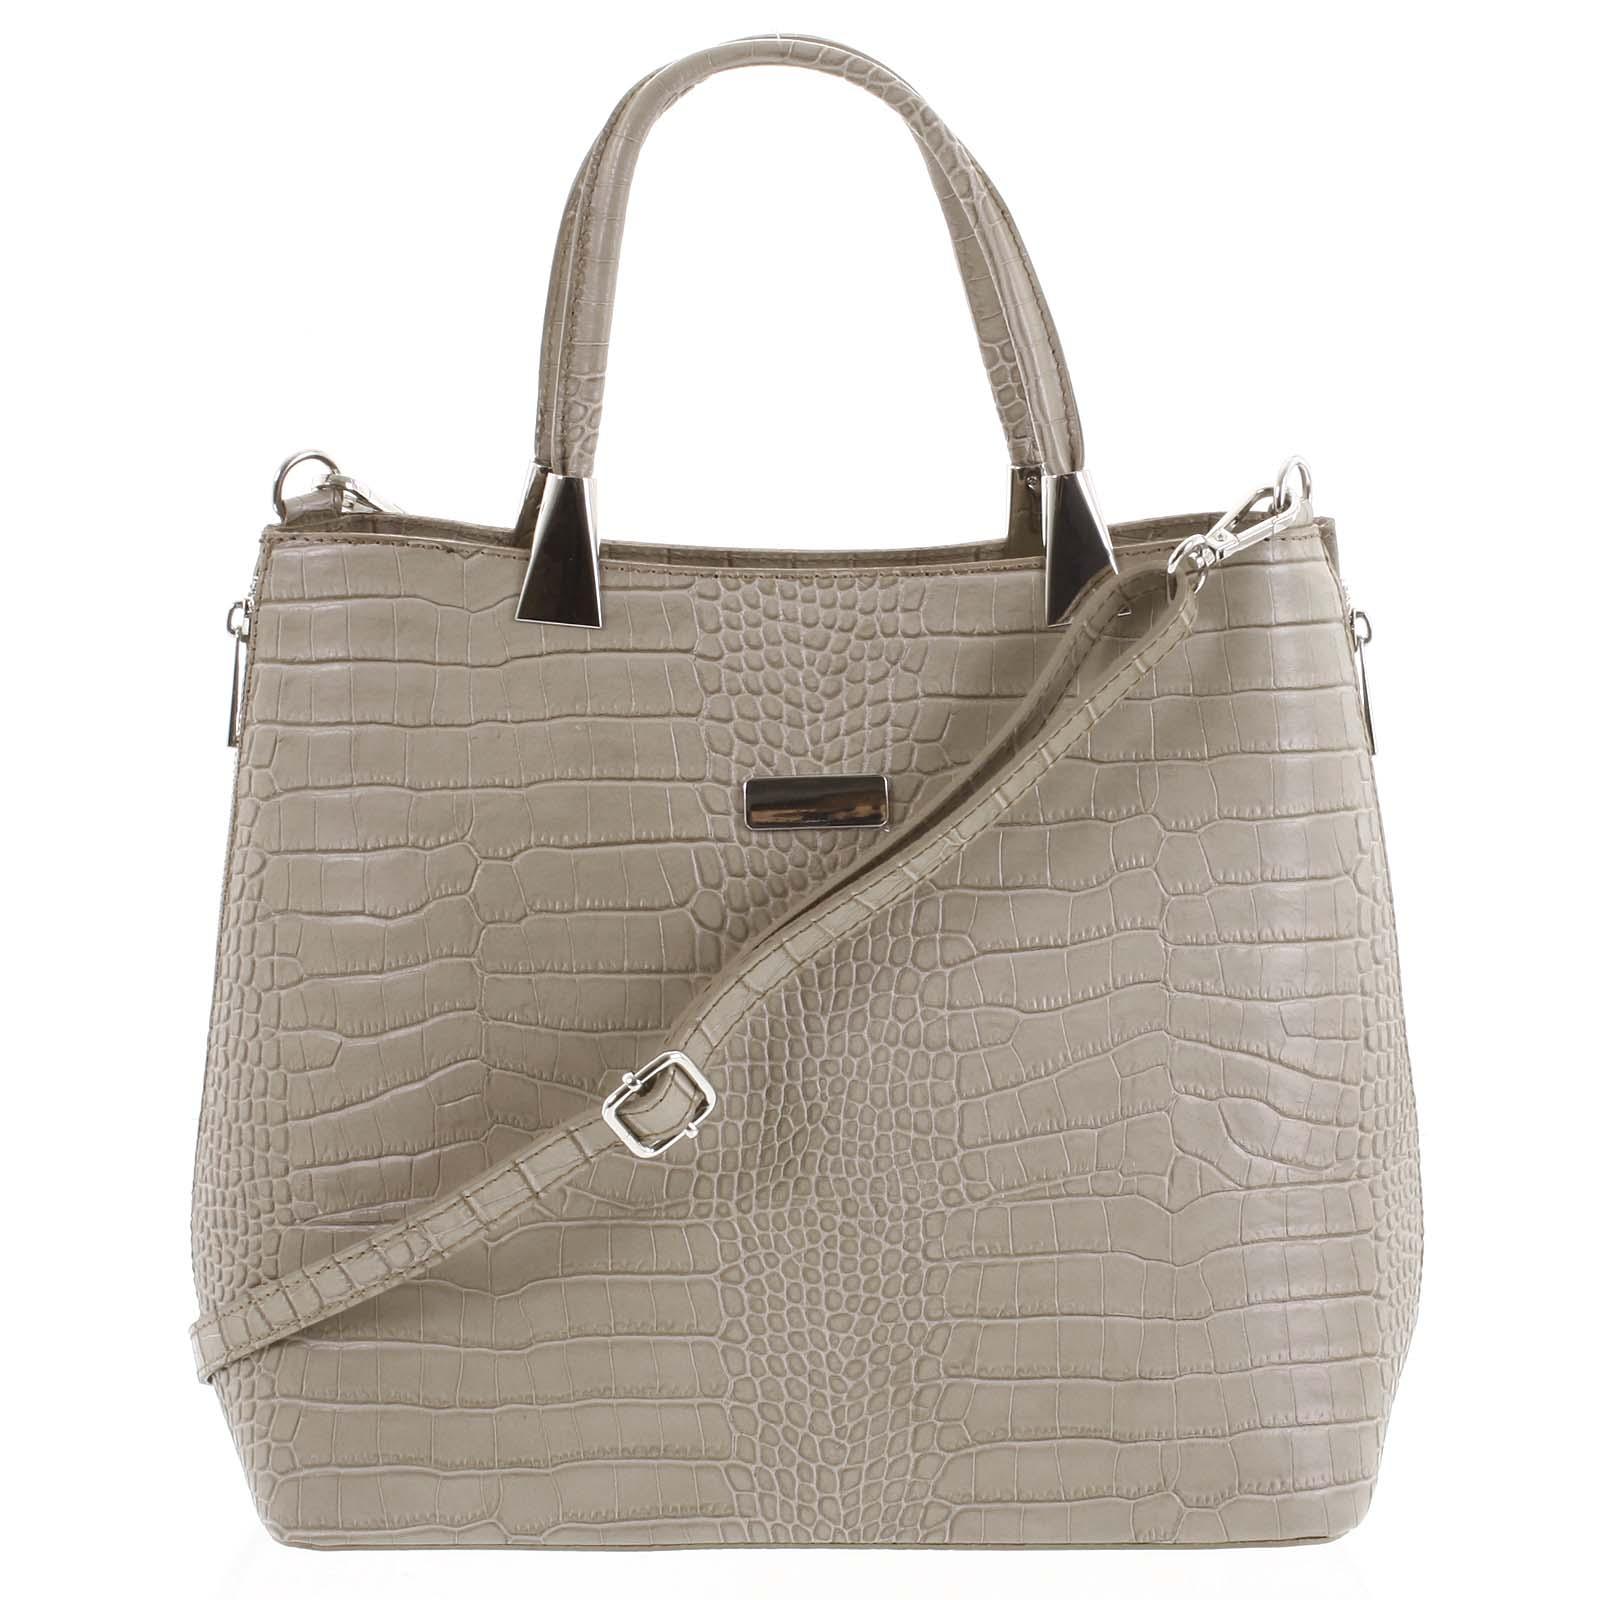 Luxusná dámska kožená kabelka taupe - ItalY Marion taupe